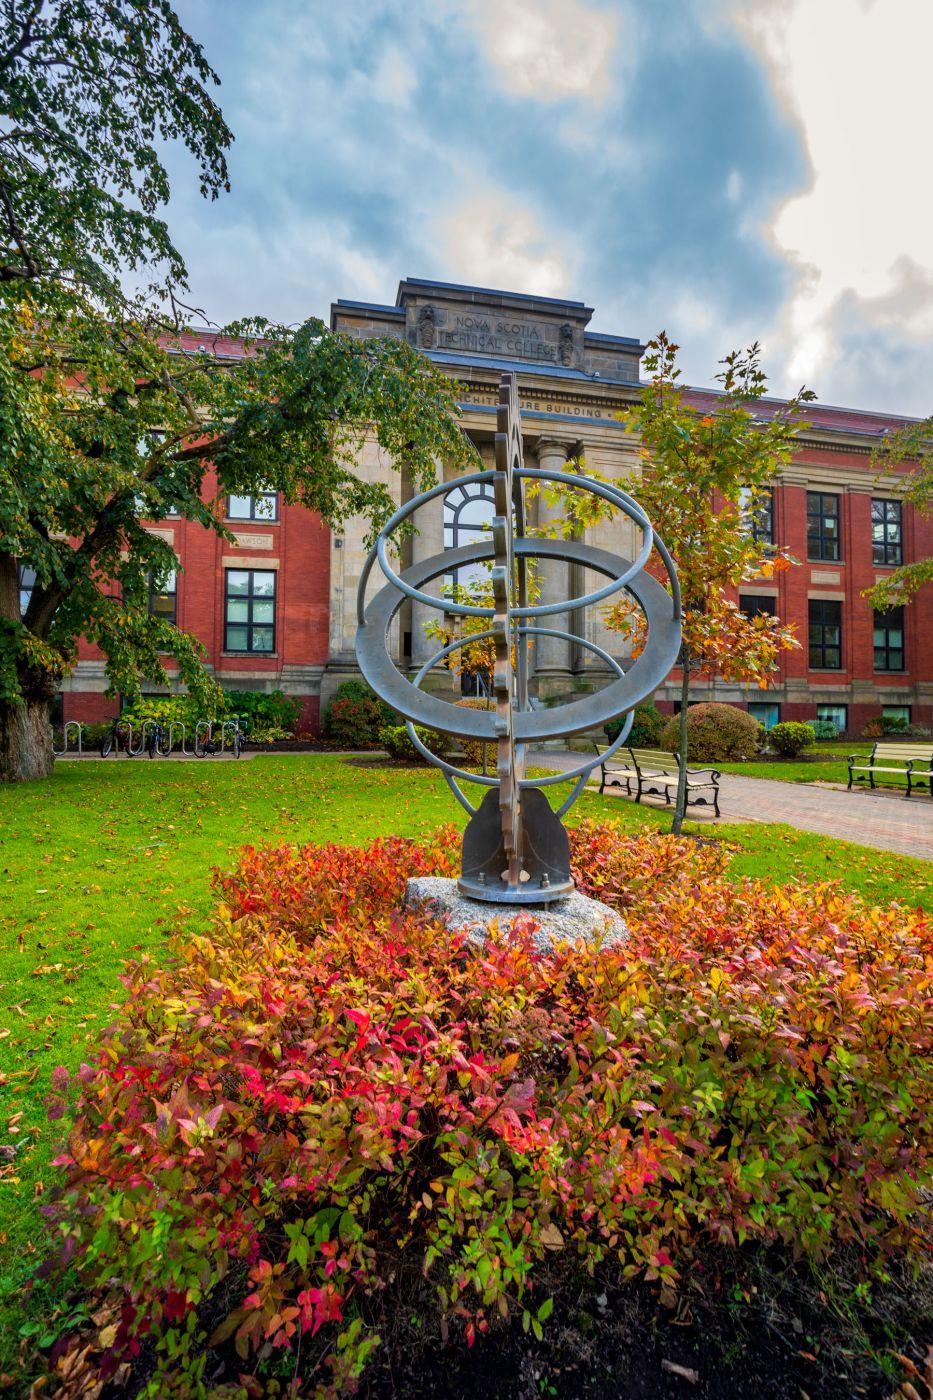 Nova Scotia Technical College Halfax, Canada